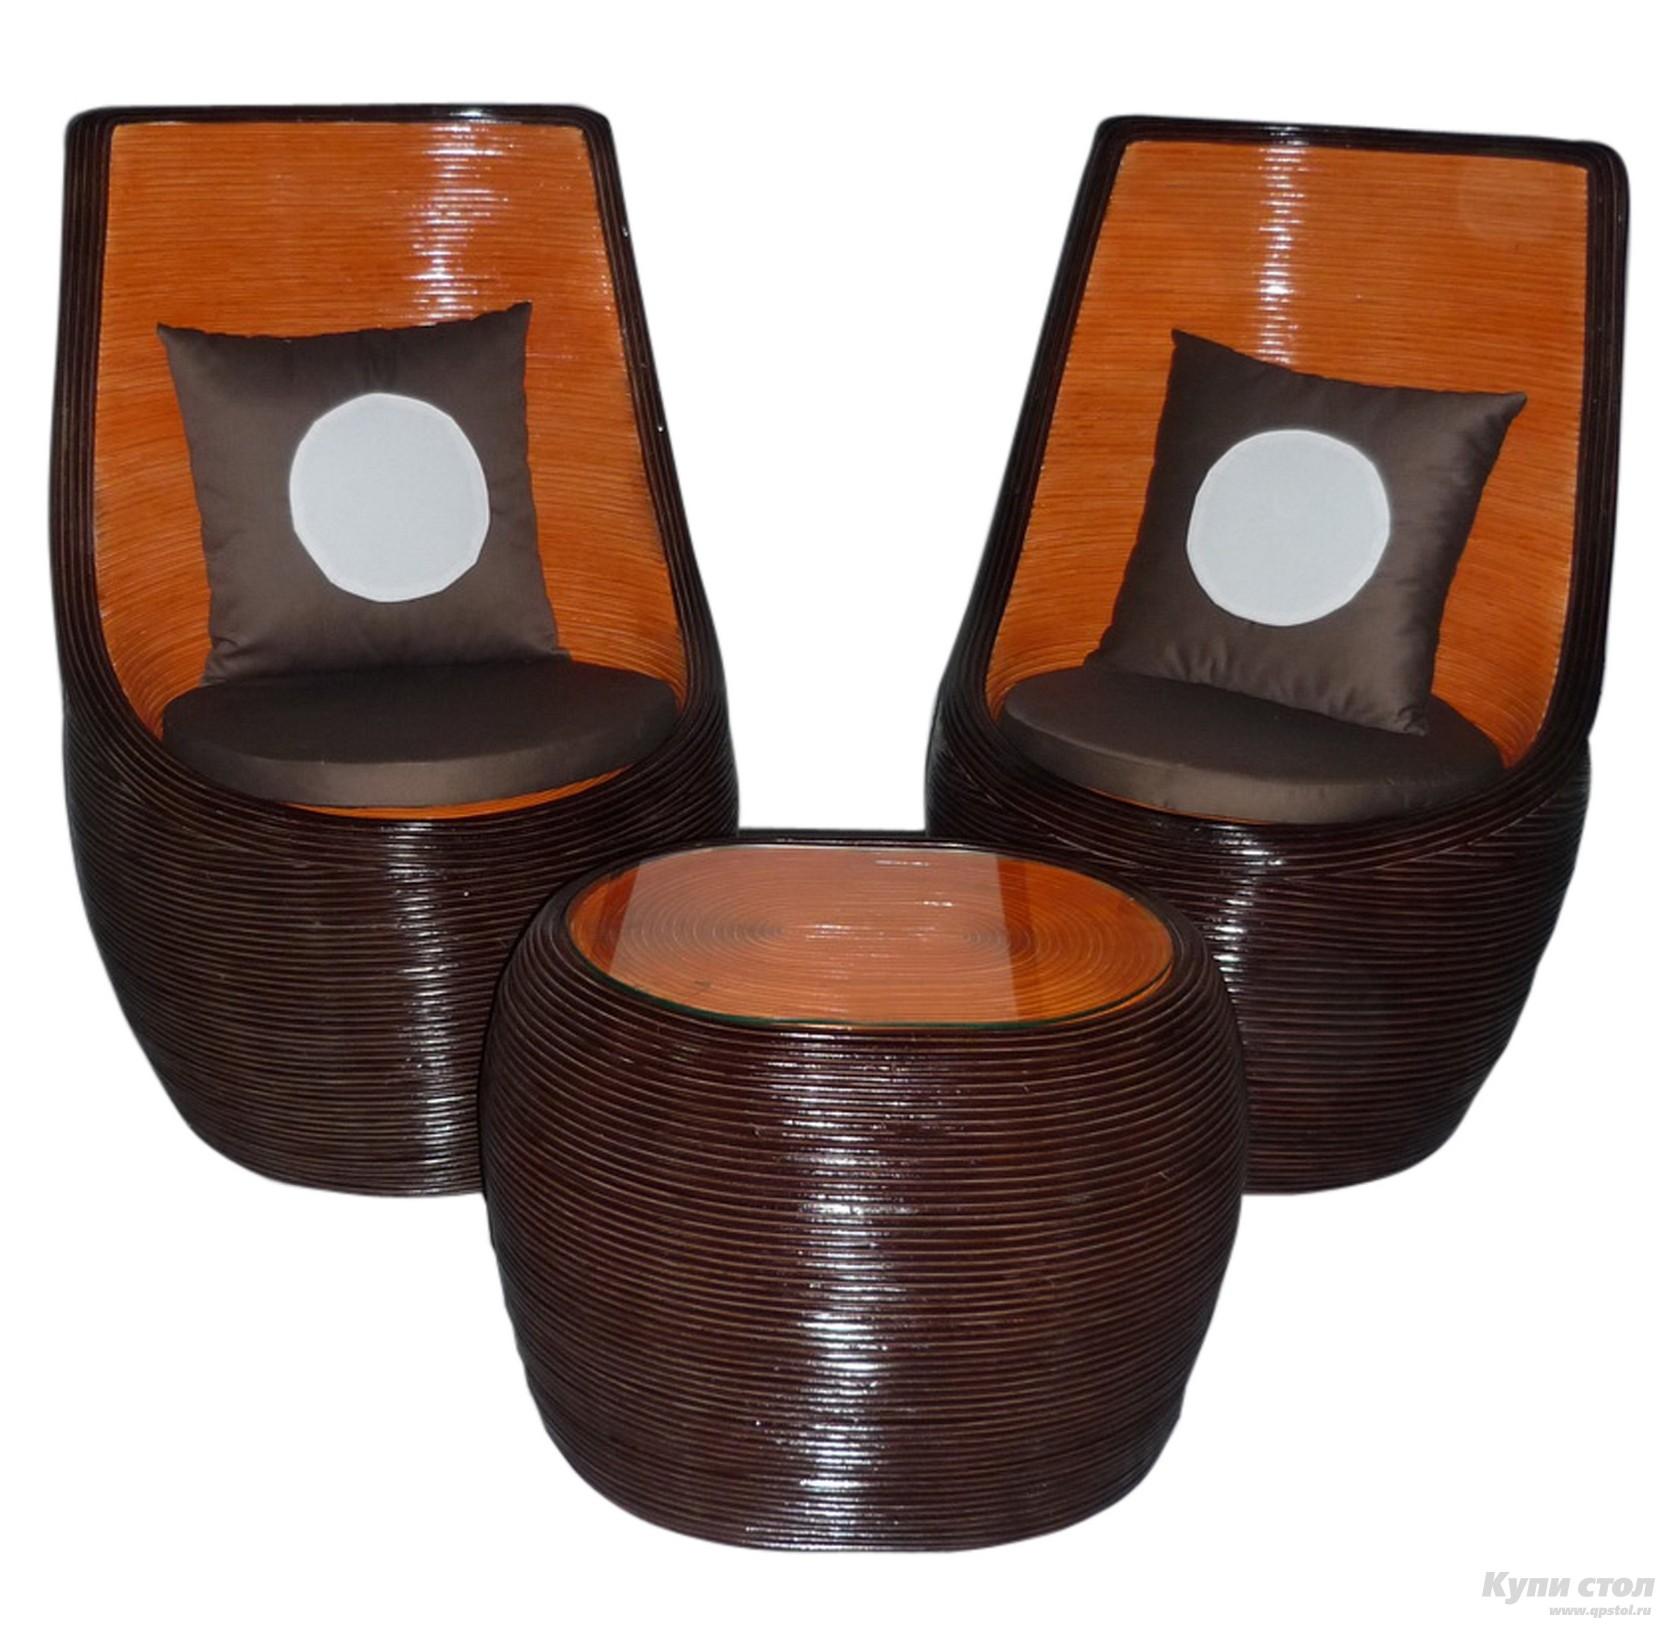 Комплект плетеной мебели Orbital КупиСтол.Ru 24610.000